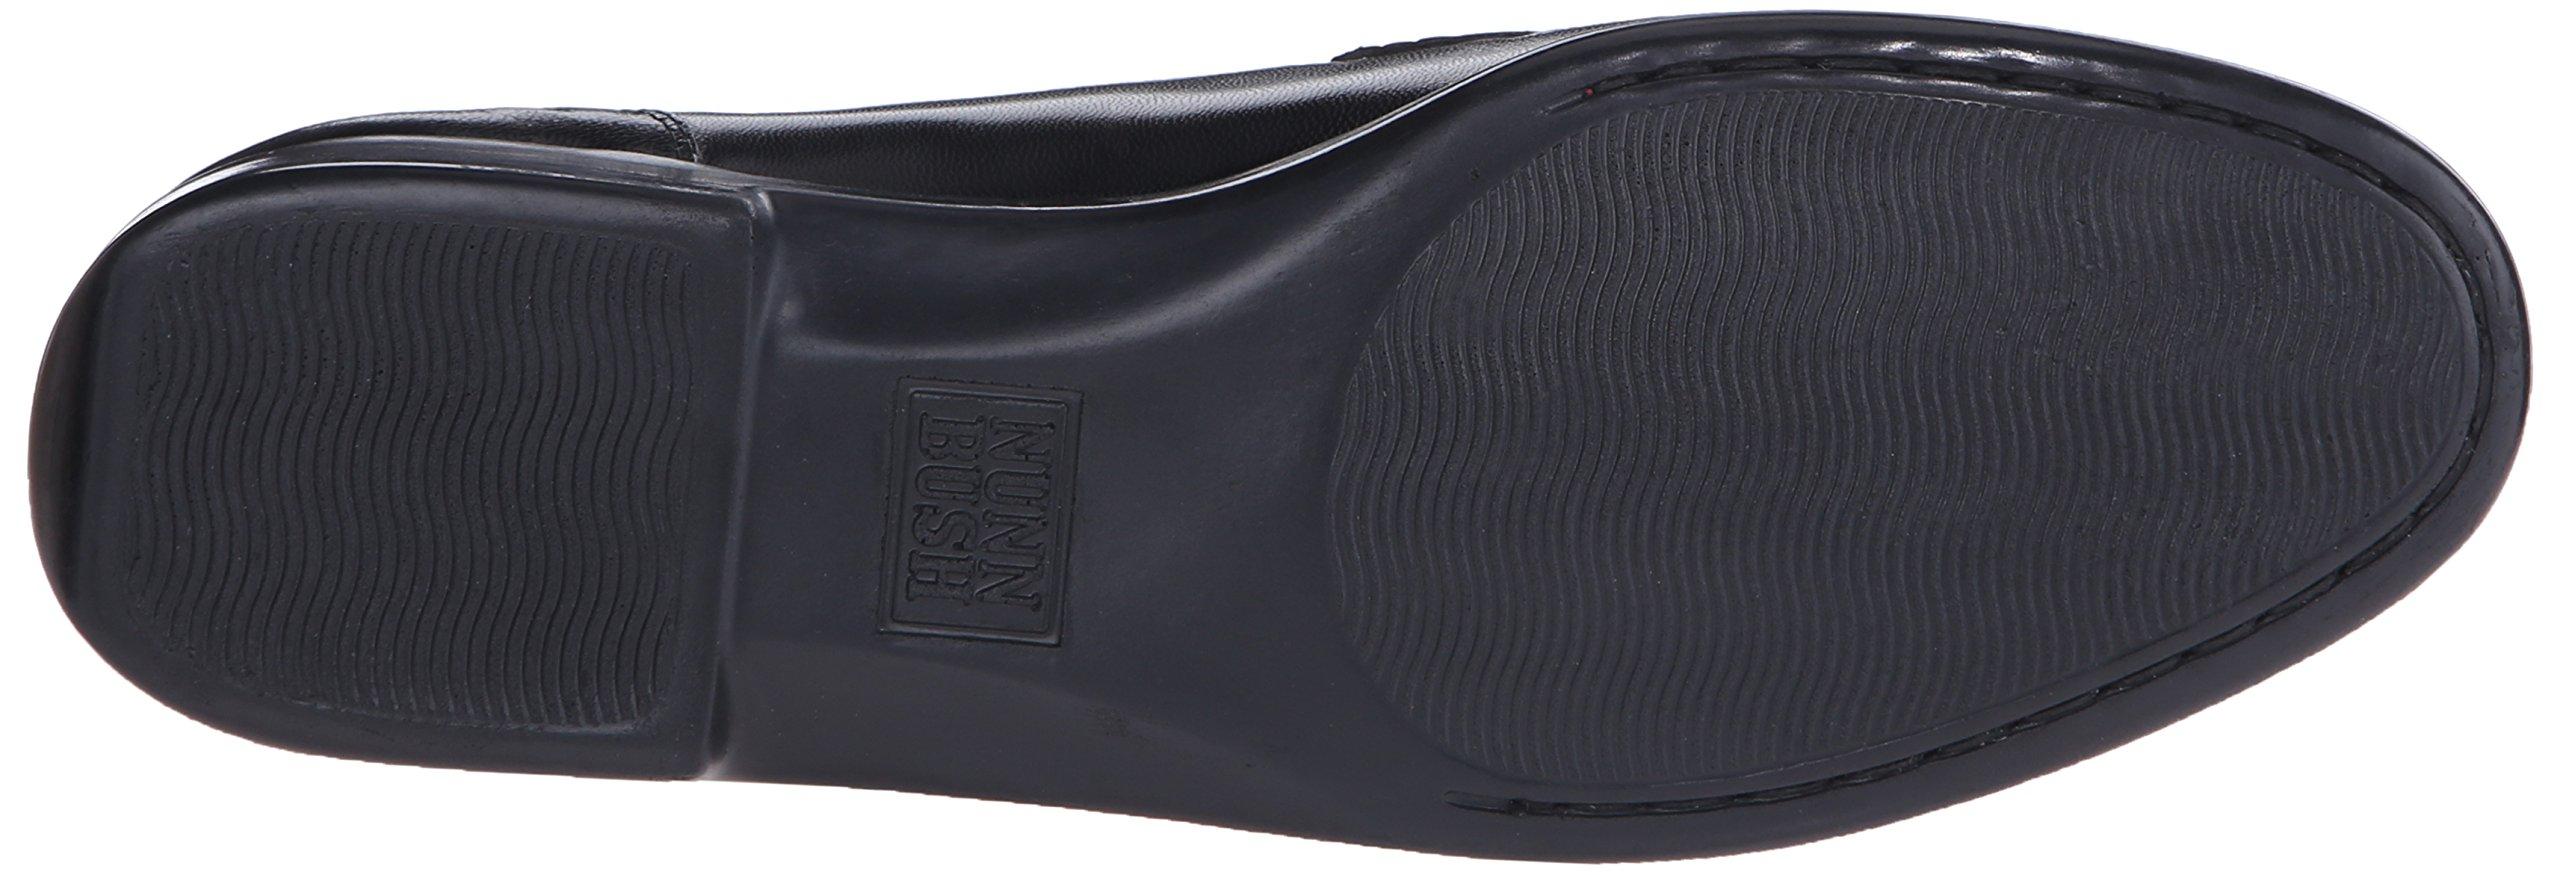 Nunn Bush Men S Bentley Loafer Black 7 M Choose Sz Color